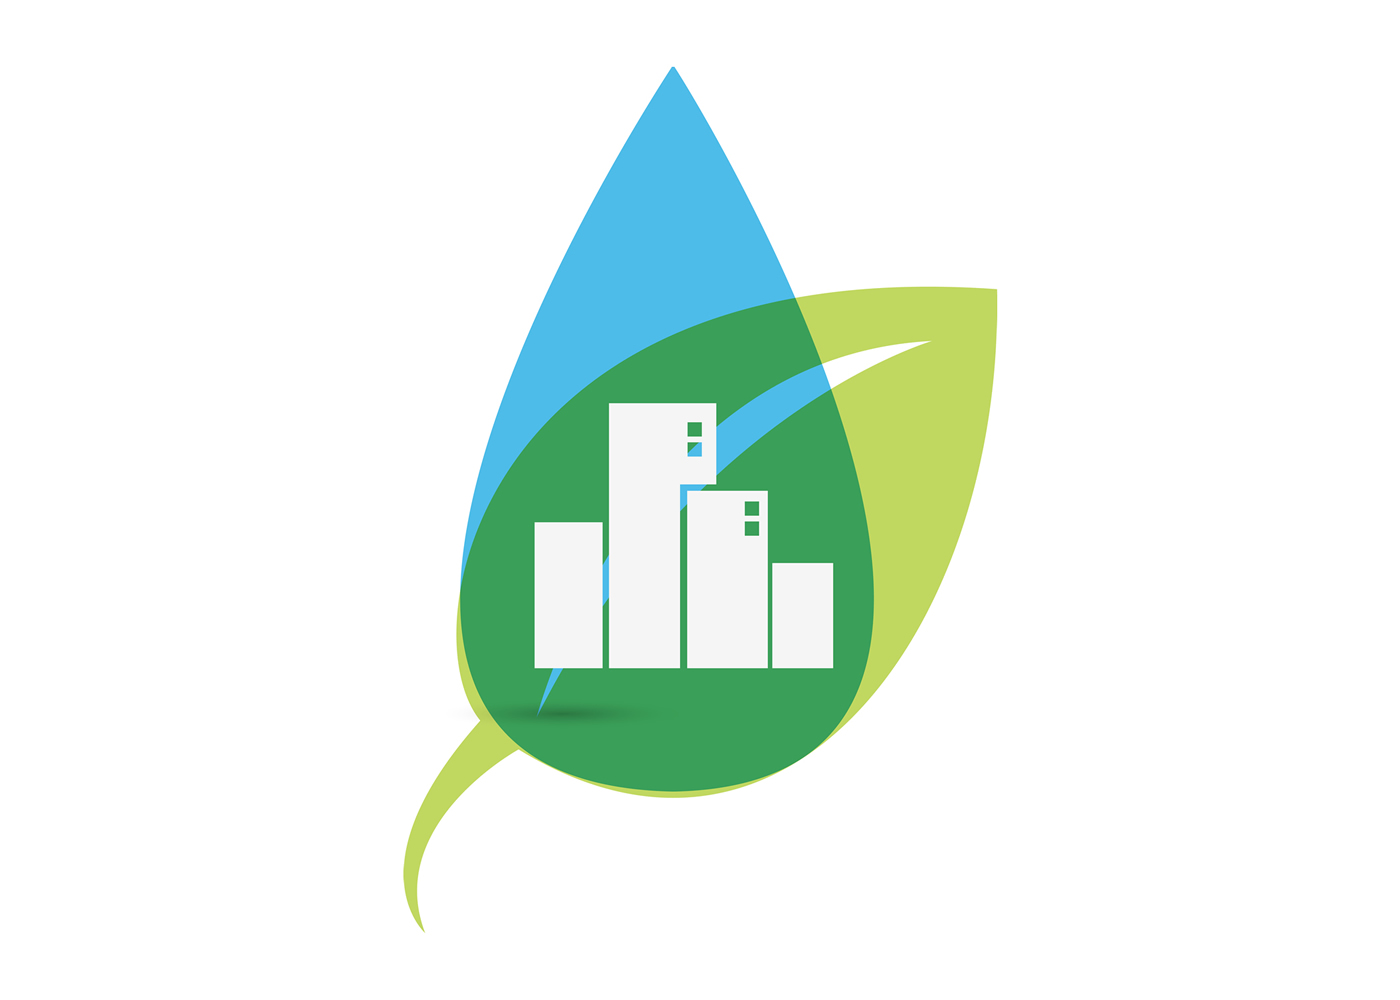 naem-2018-article-eco-city-leafs-700x500